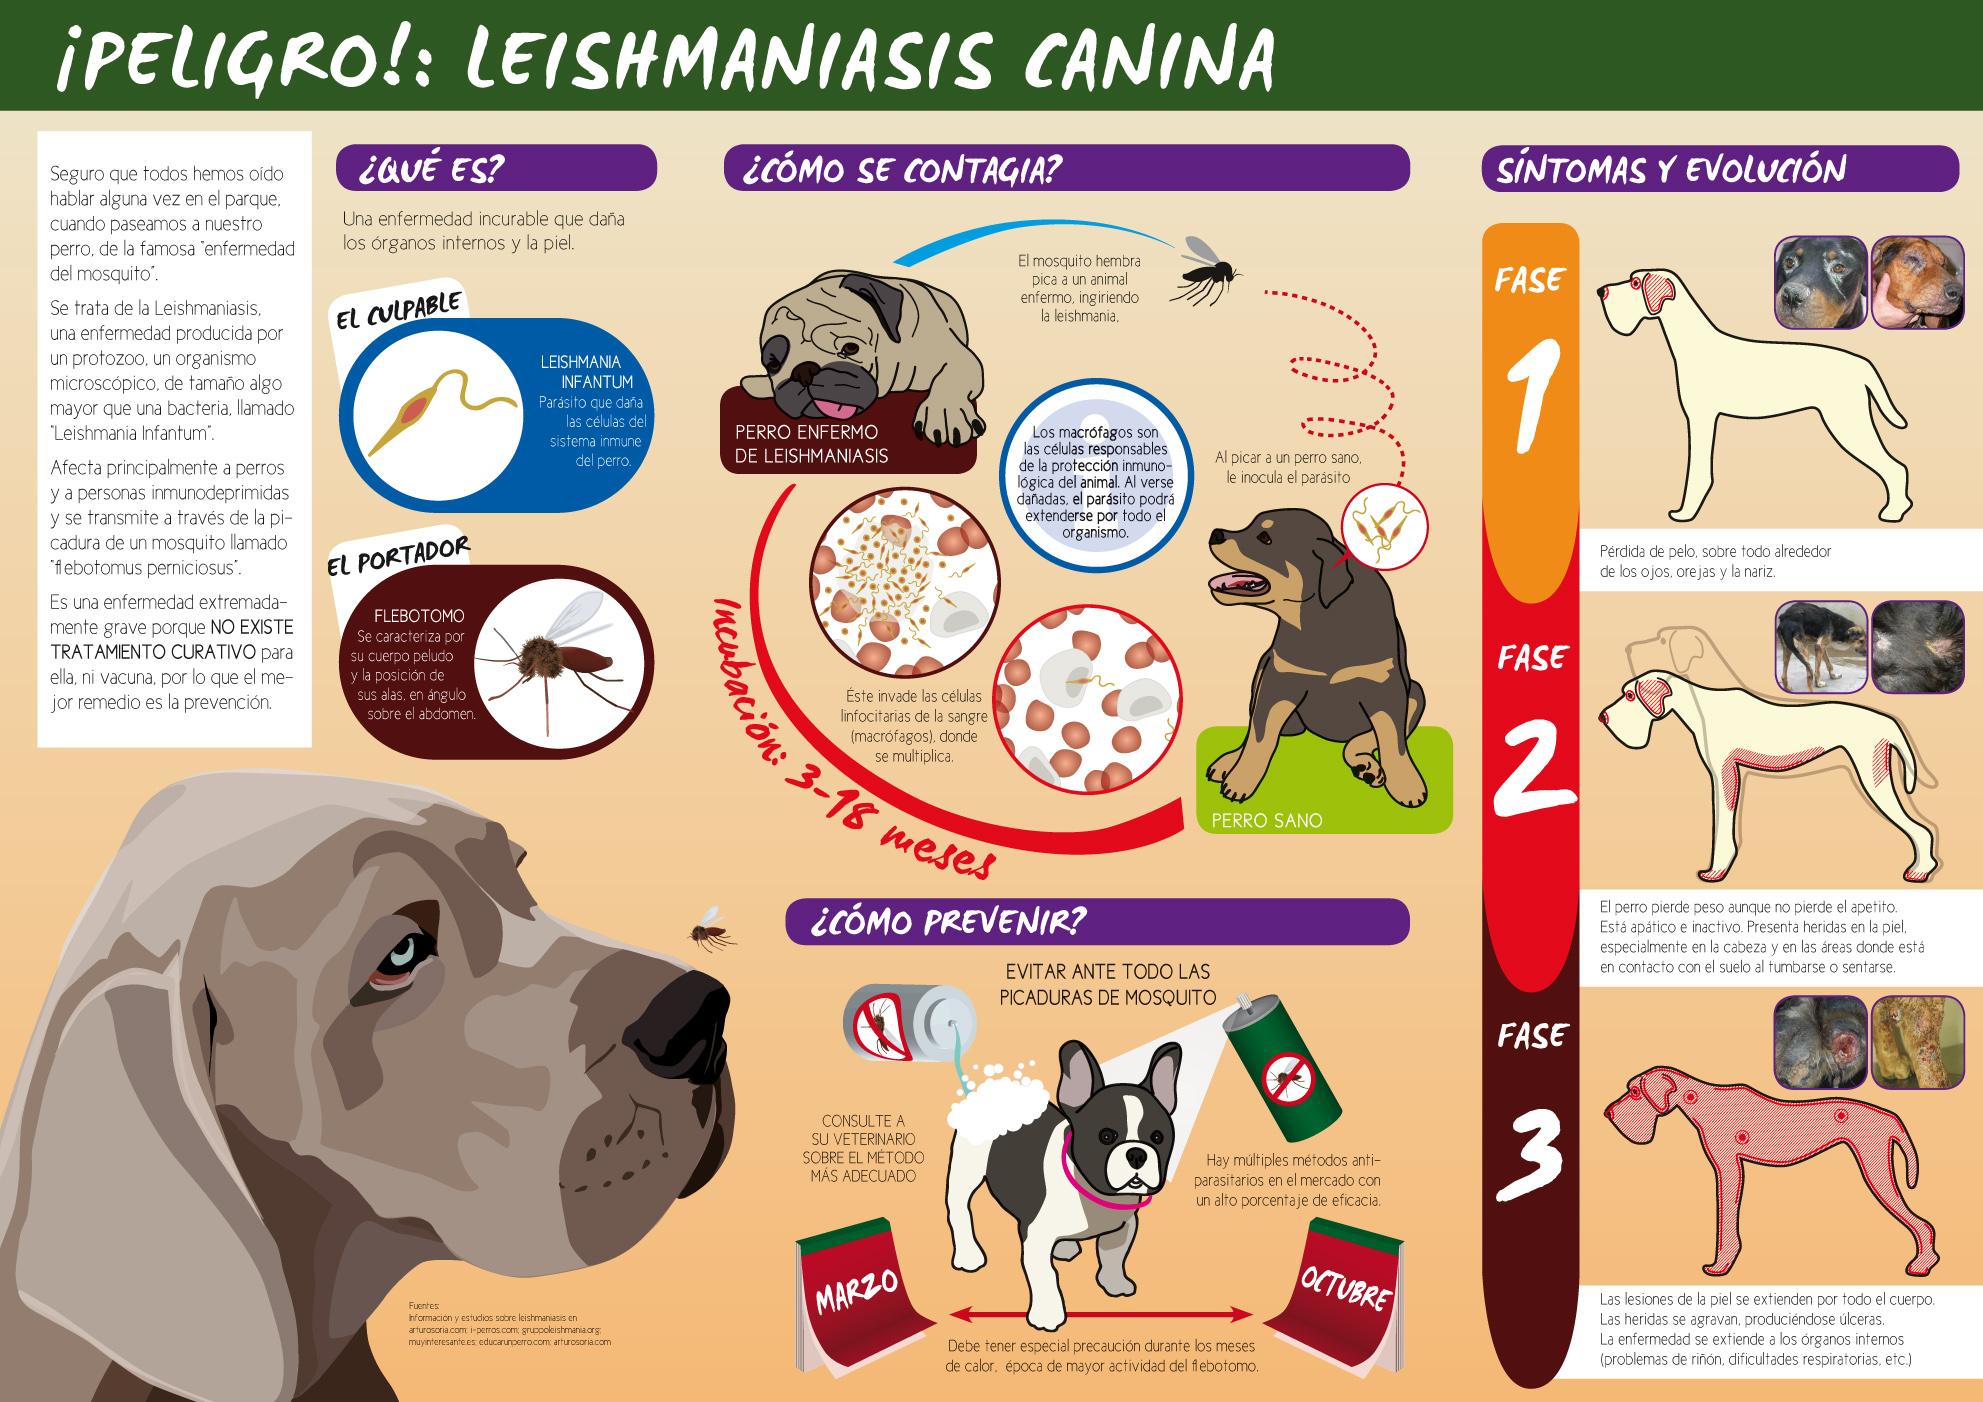 Campaña contra la Leishmania